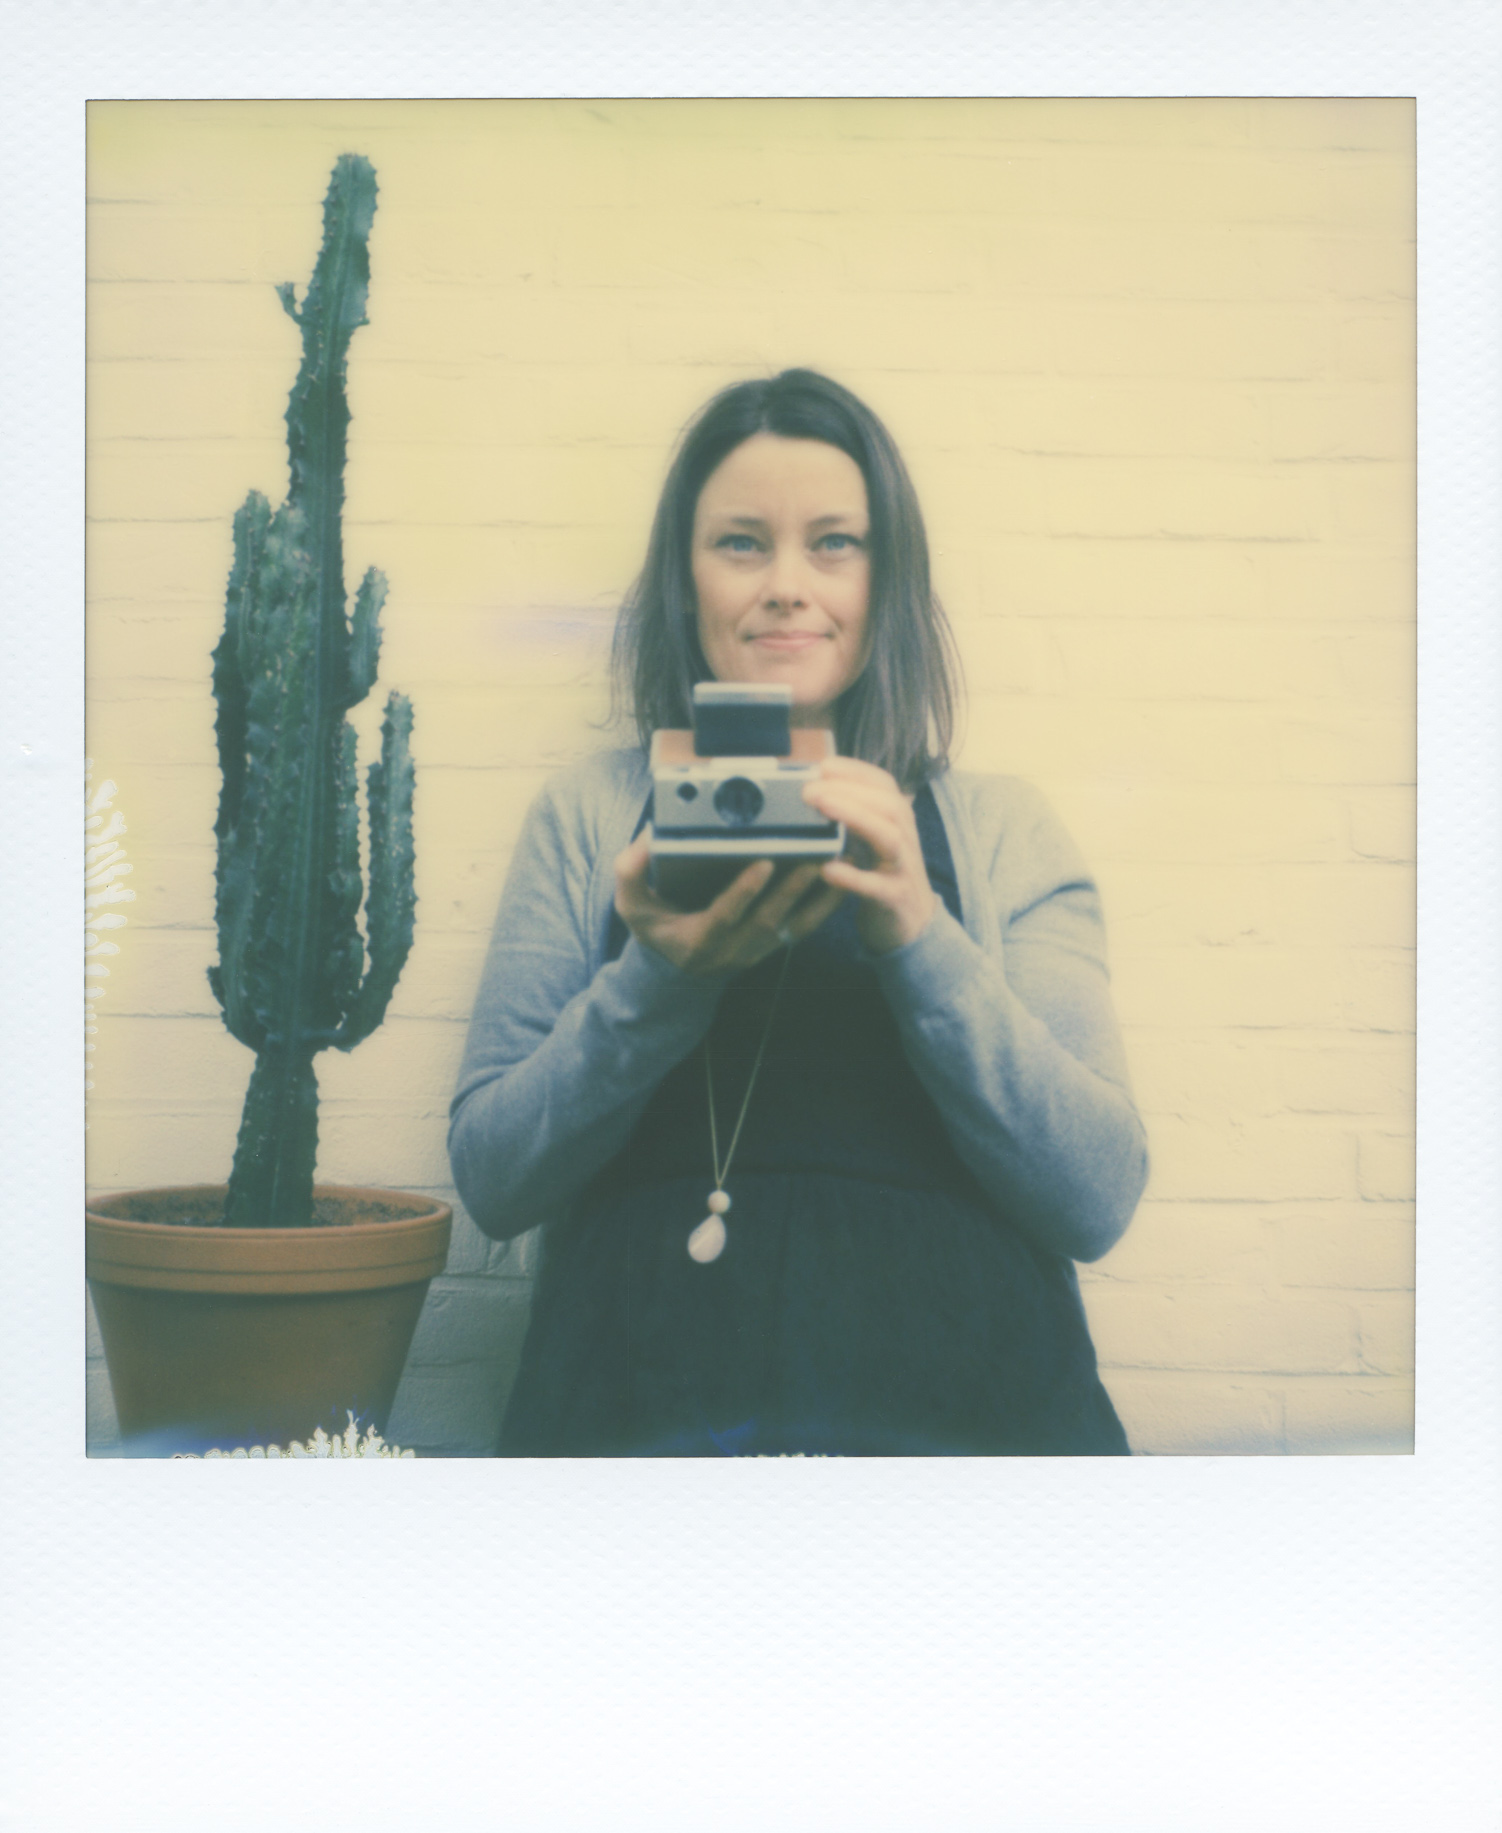 Atlanta-Amsterdam-Polaroid-Impossible-Project-self-portrait-by-On-a-hazy-morning-Amsterdam-6.jpg